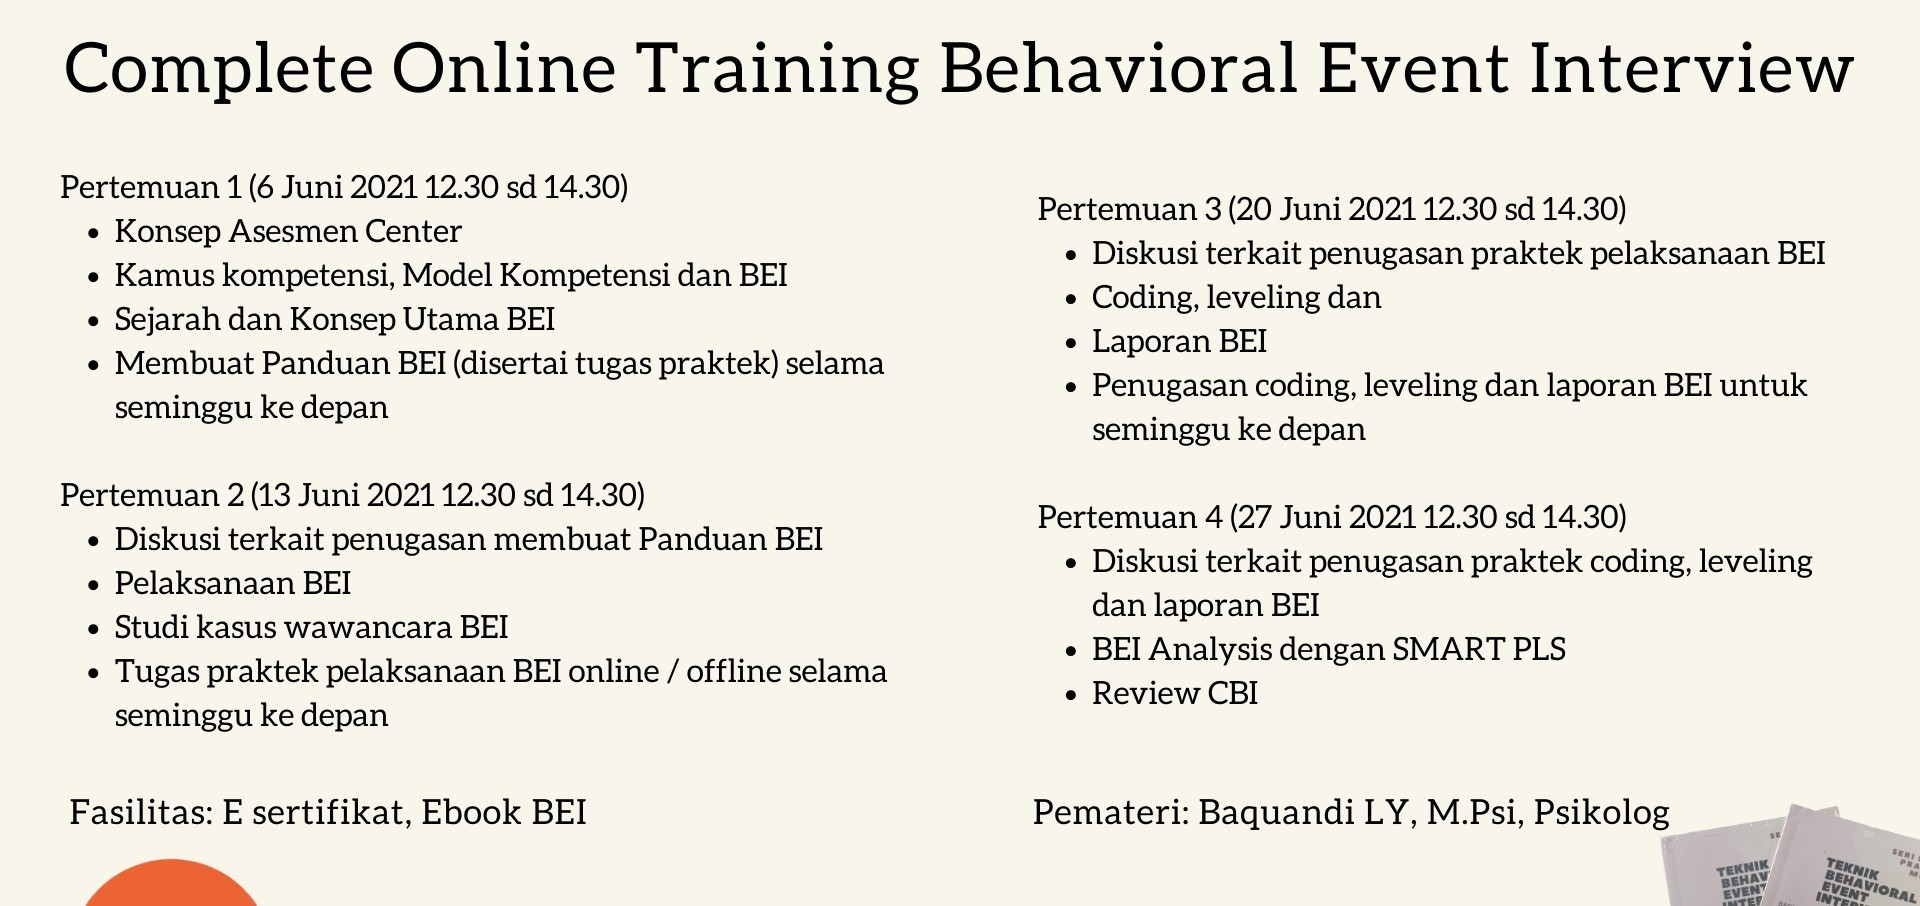 Complete Behavioral Event Interview Online Training